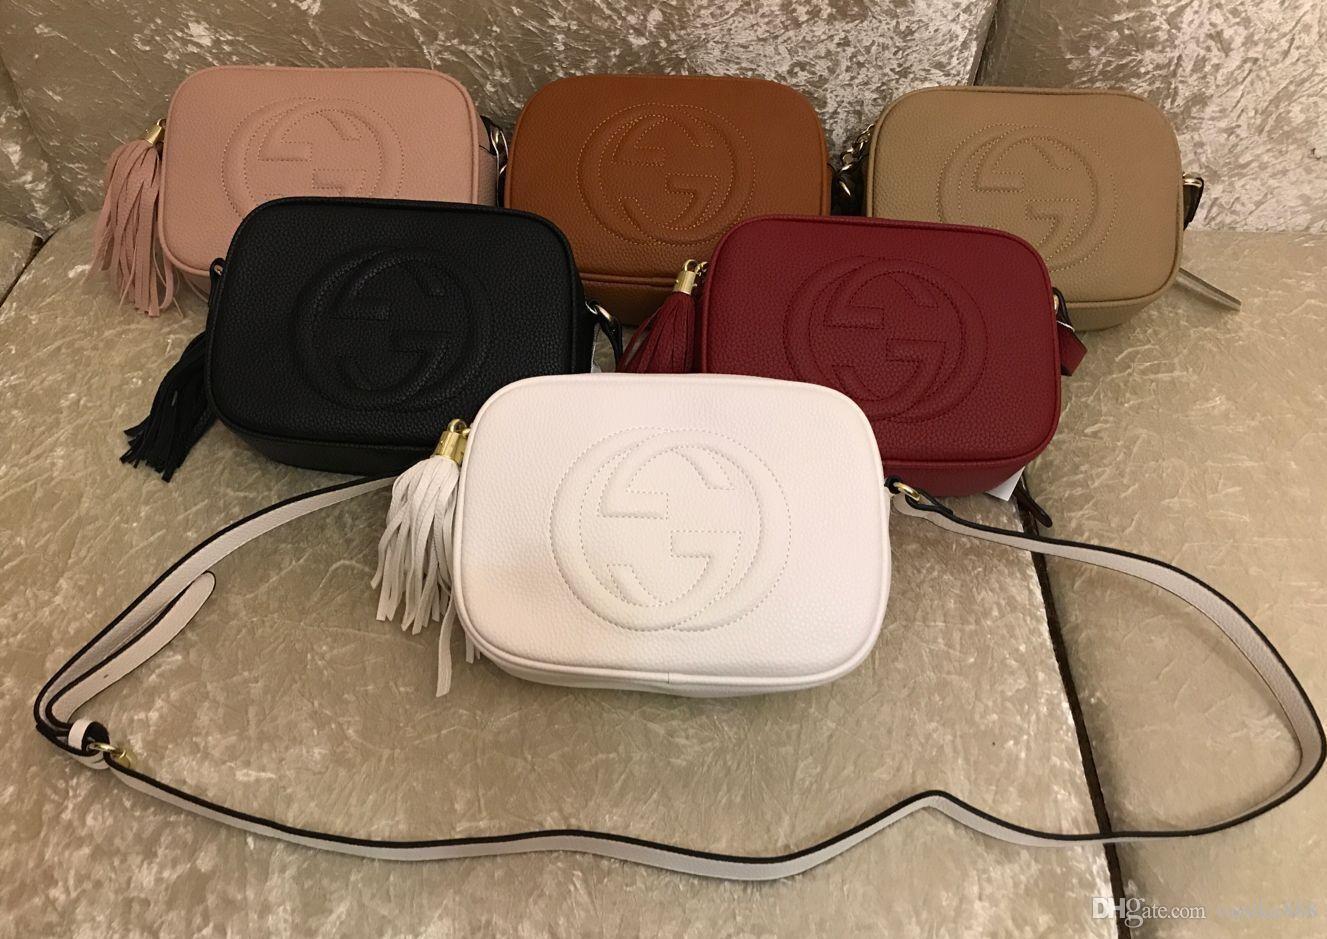 7d1e608efd5 2019 LOUIS VUIT Zwj TON Ins Super Fire Small Square Bag Supr Zwj Eme 2018  New Brand Bag Chain Mirror Single Shoulder Gucc Zwj I Bags From Ousika888